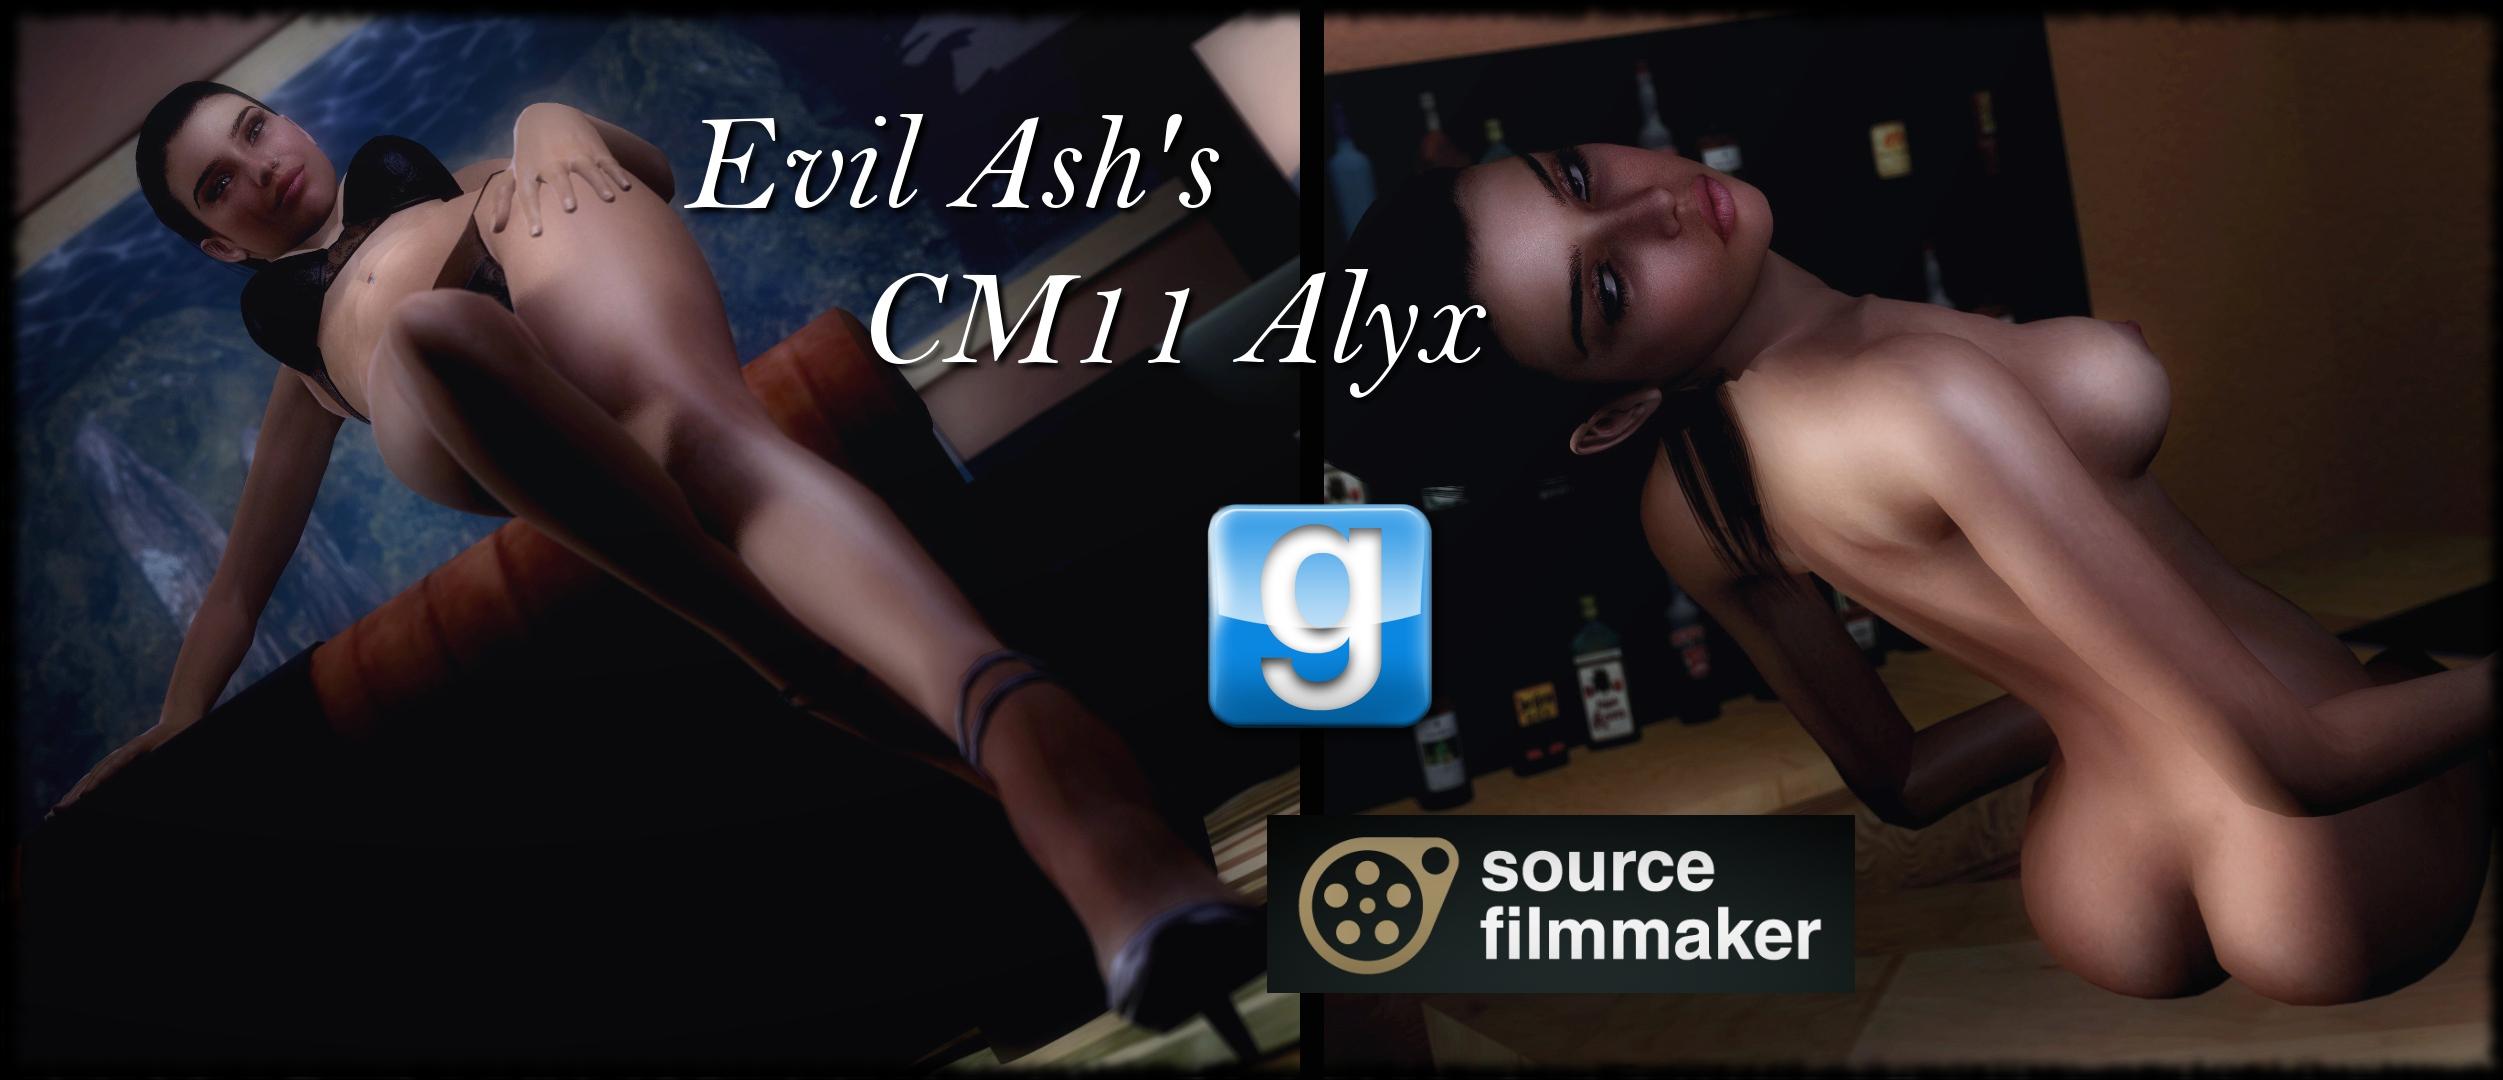 Gmod alyx nude model erotic clips